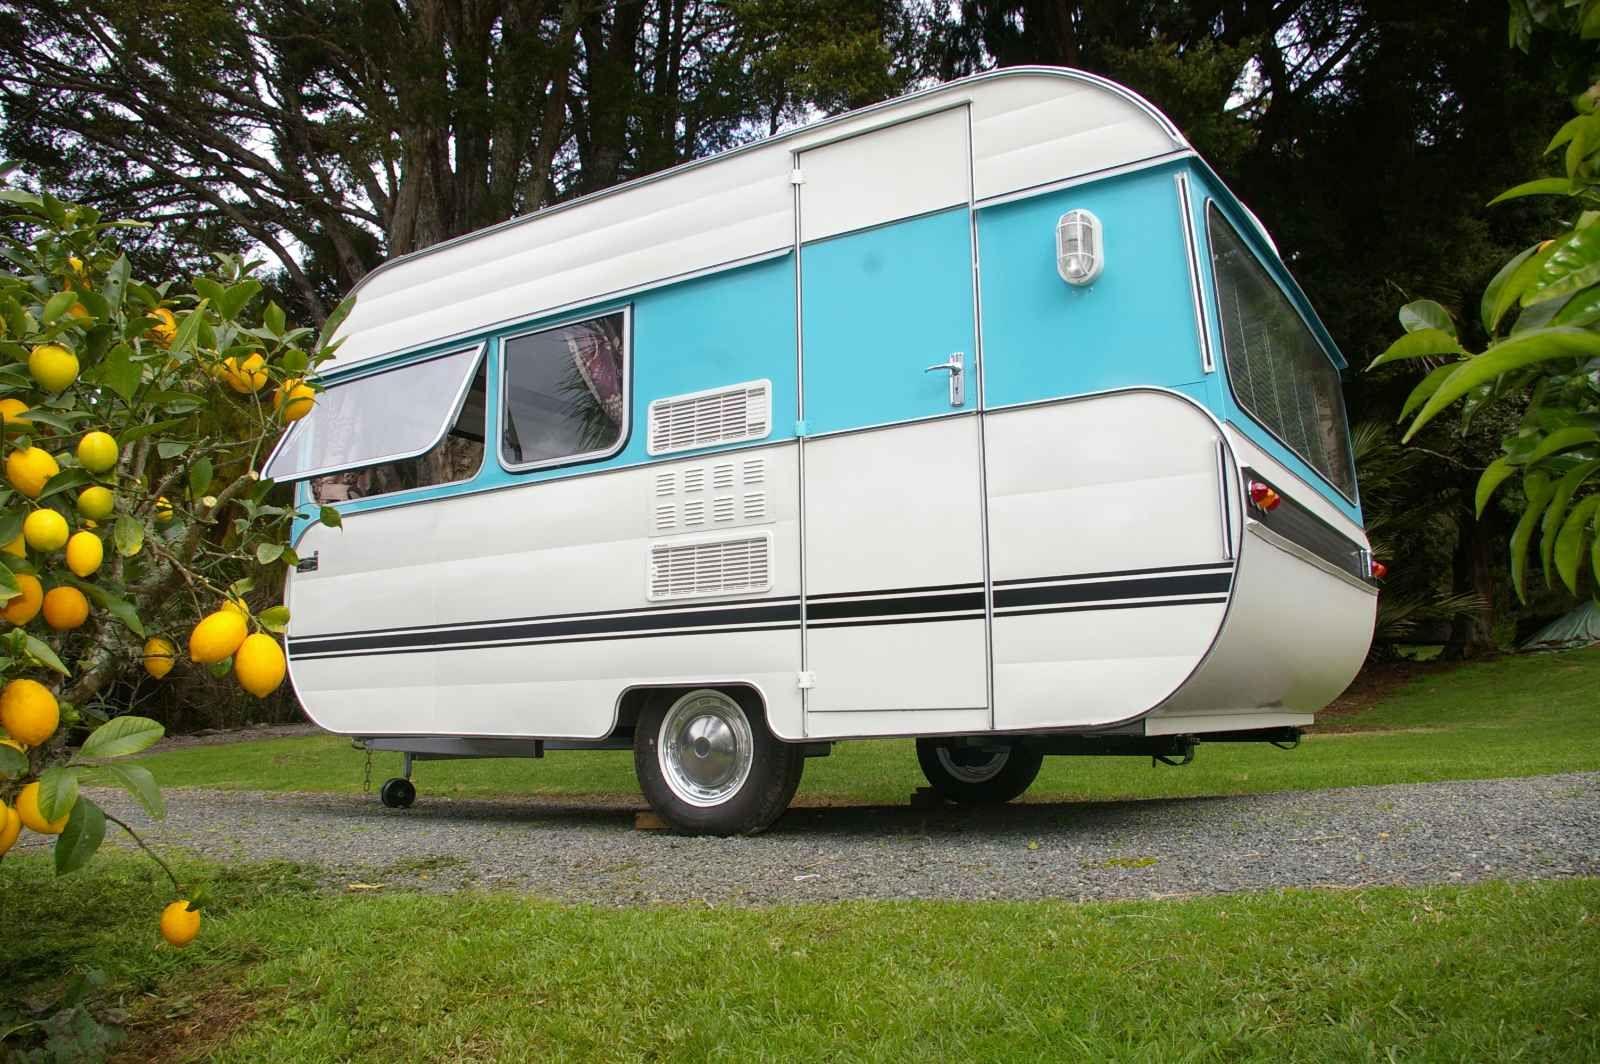 1976 liteweight 1300 vagabond 4 berth vintage travel